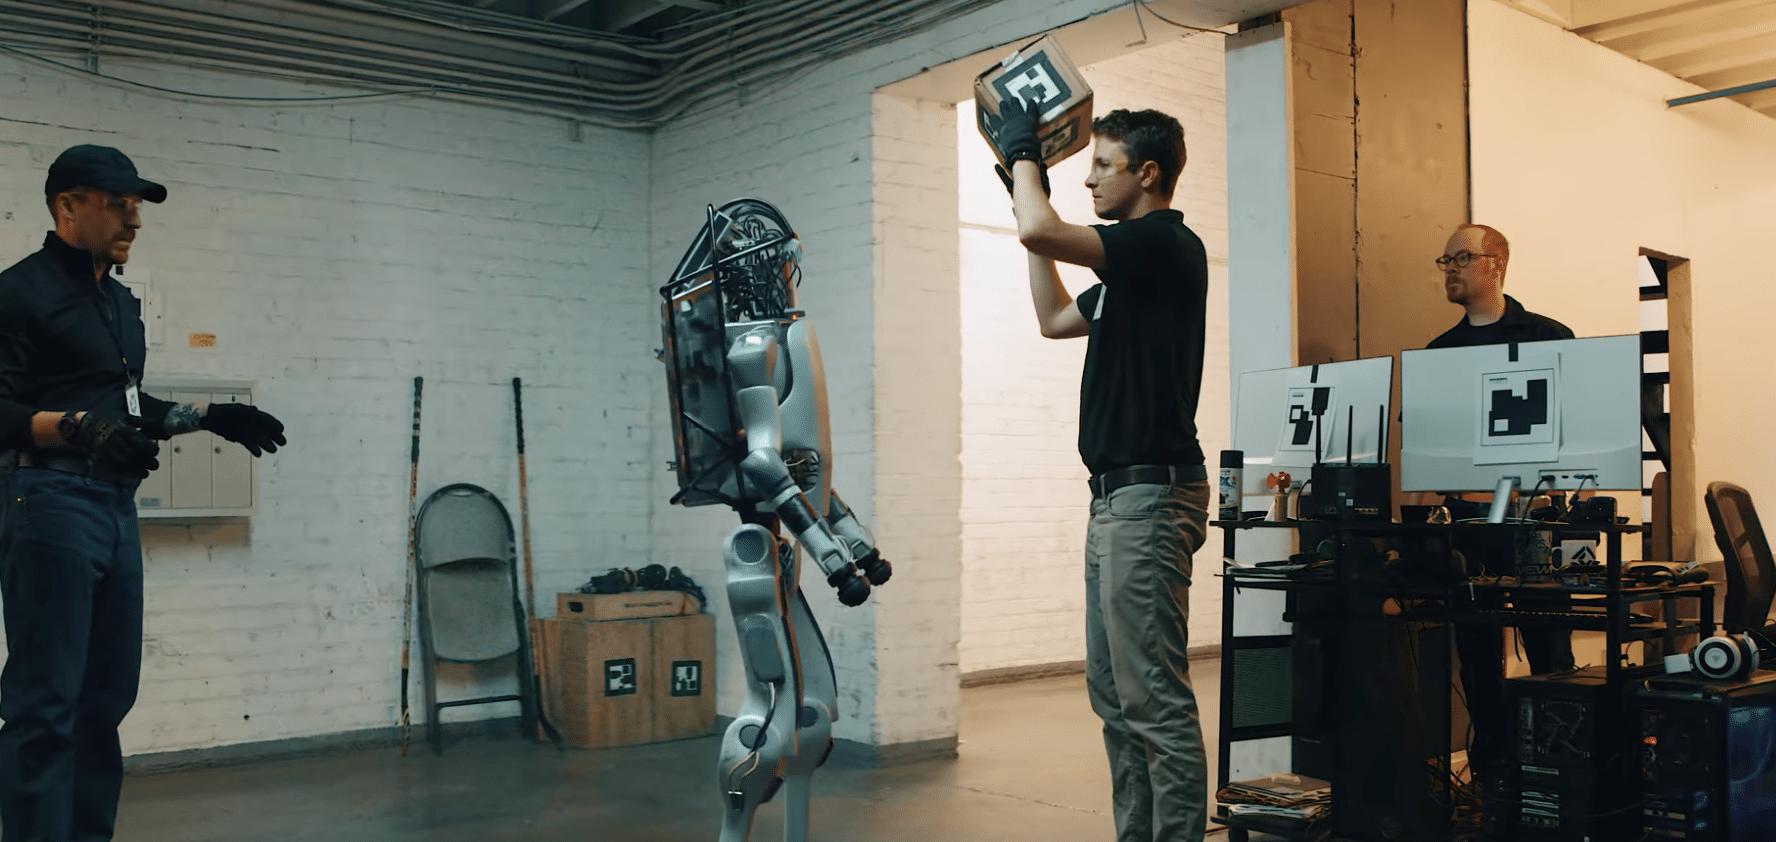 dark futures film club – robots now fight back